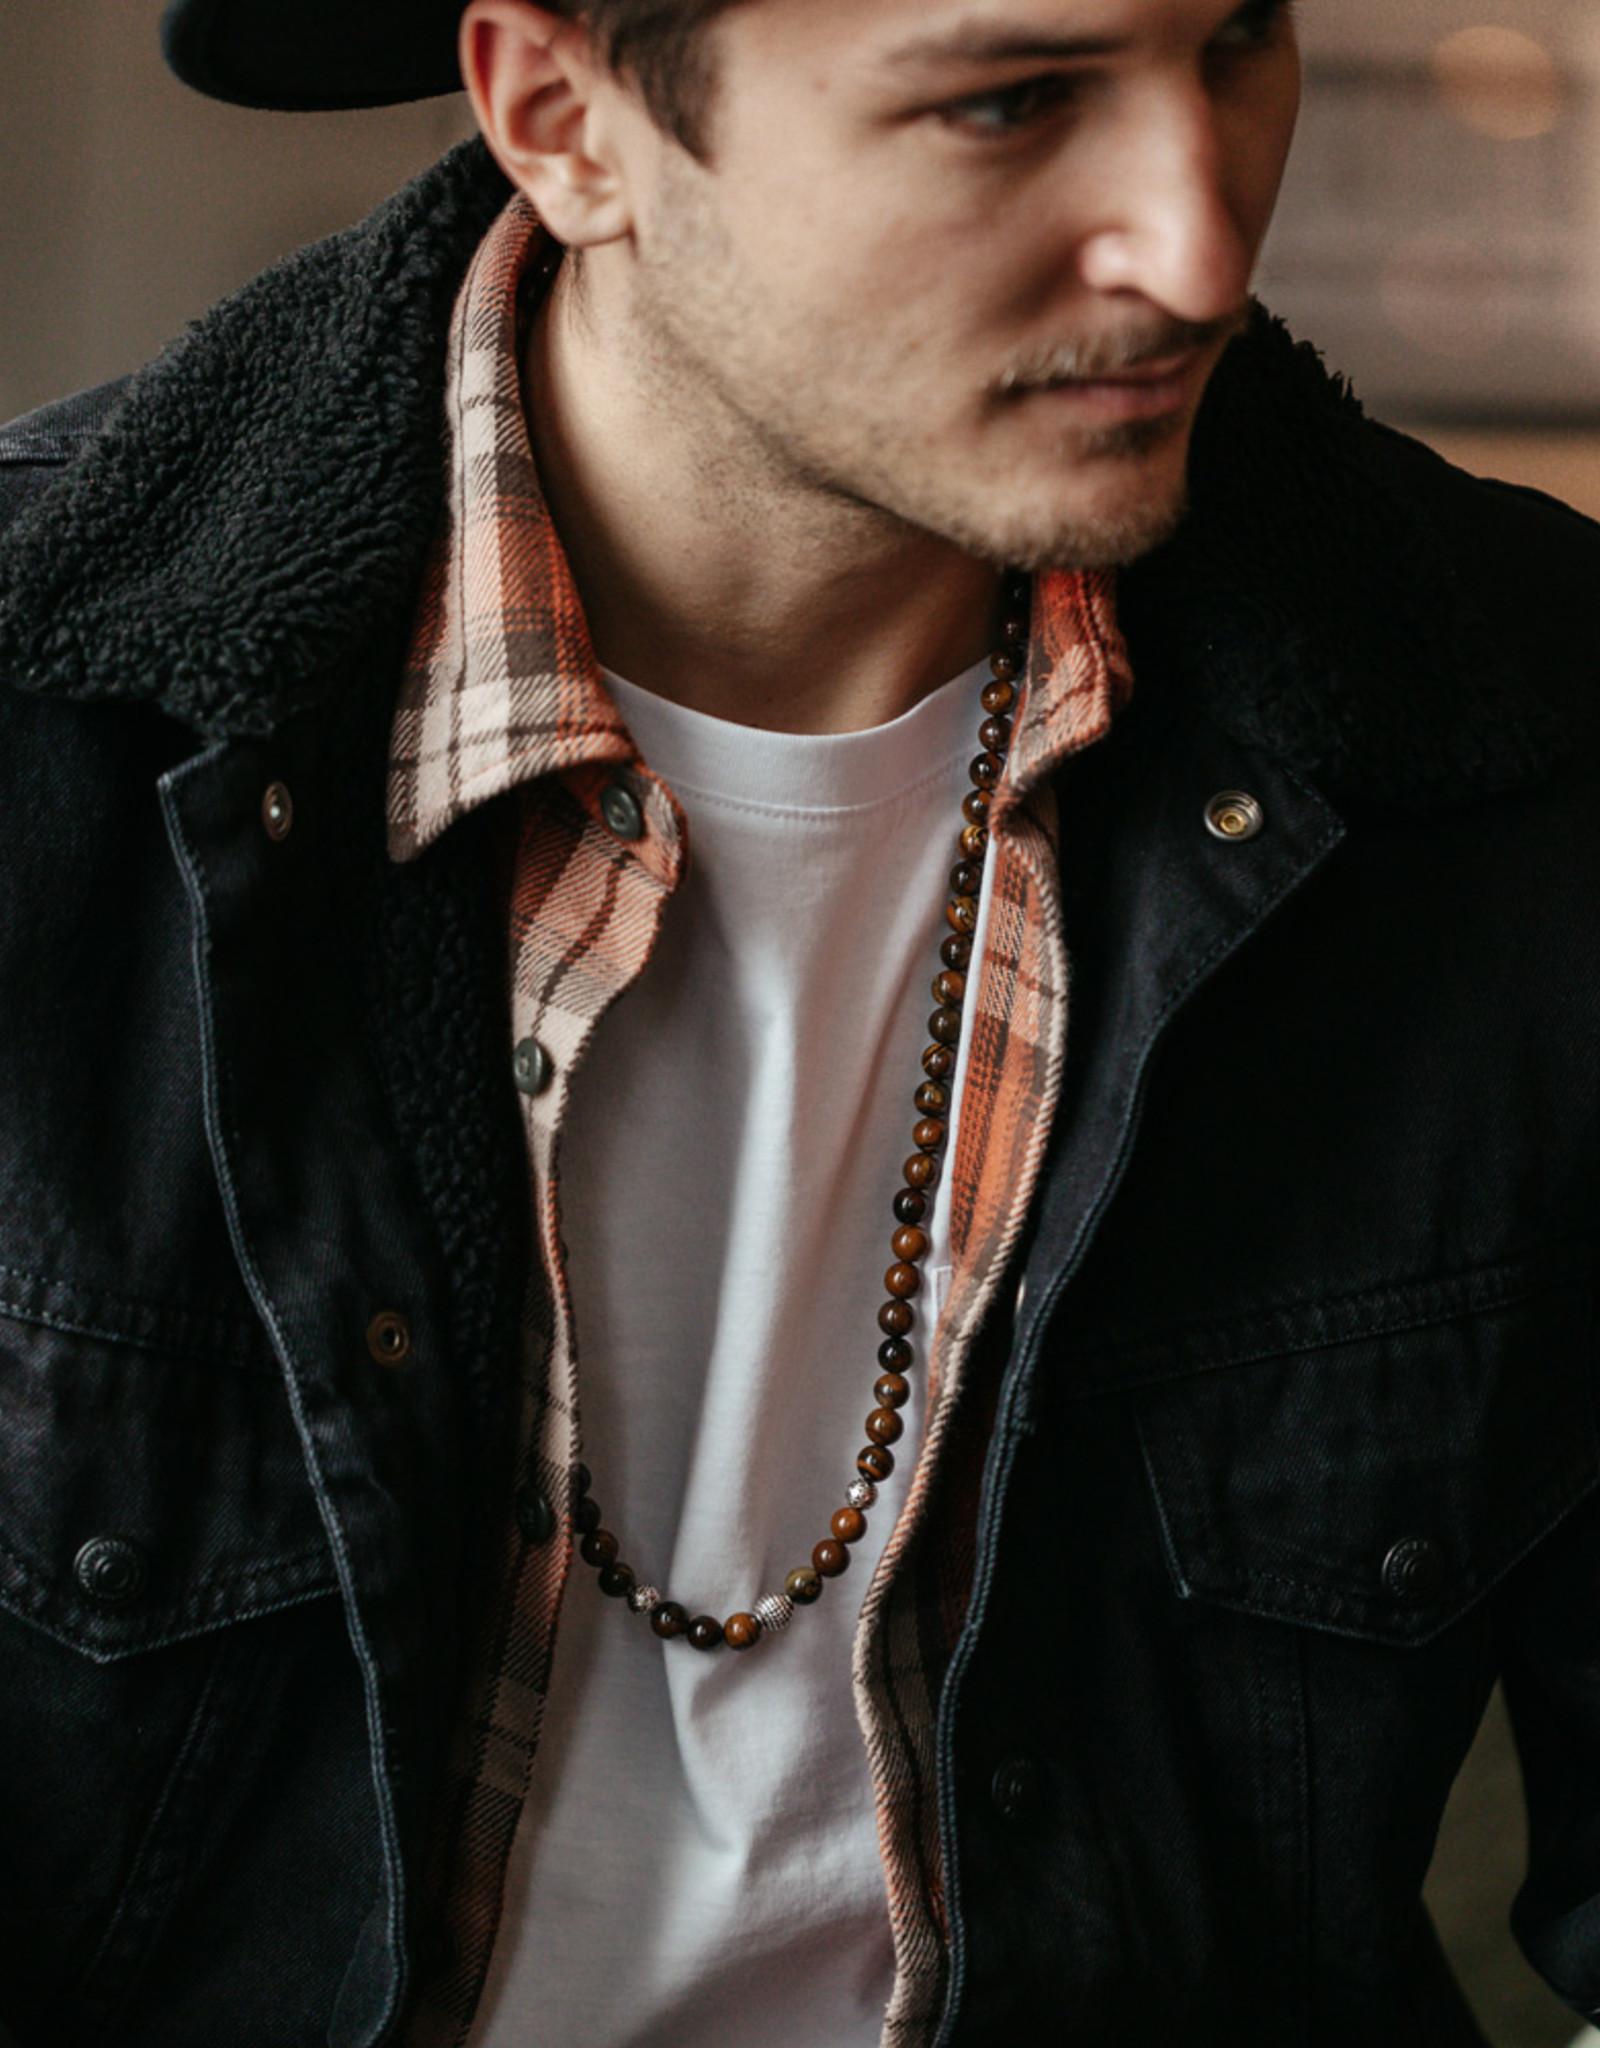 Halskette MEDAN, glanz – one size